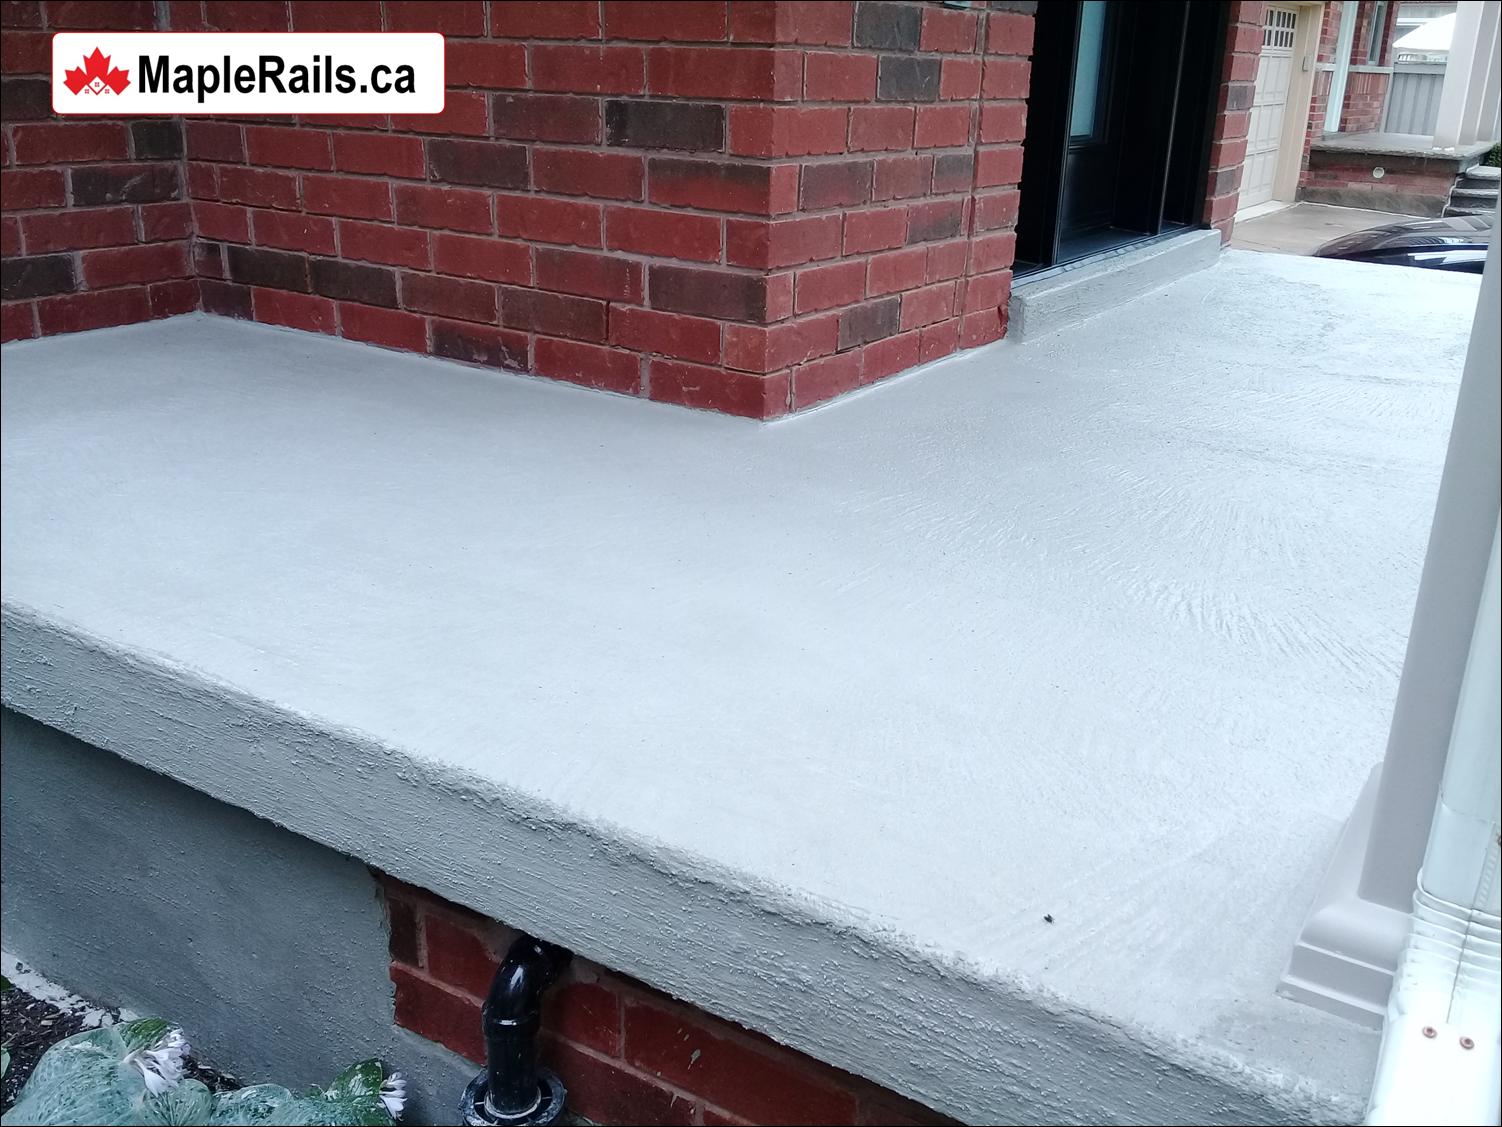 Concrete Porch Repair & Resurfacing with Atlantic Grey Concrete Coating (Kitchener, ON)